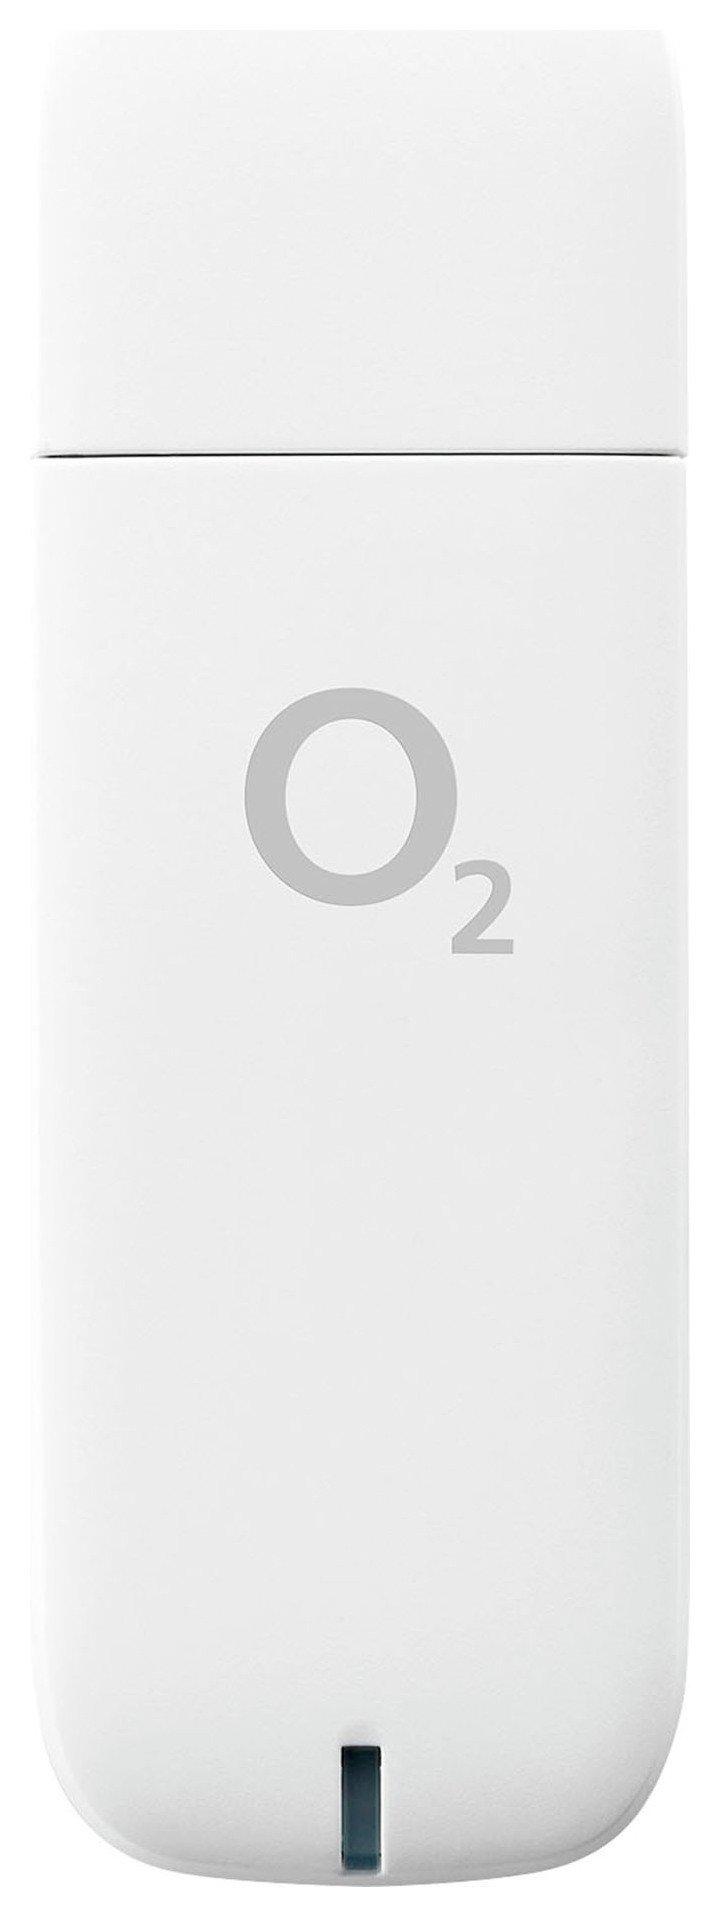 O2 O2 3G Dongle.